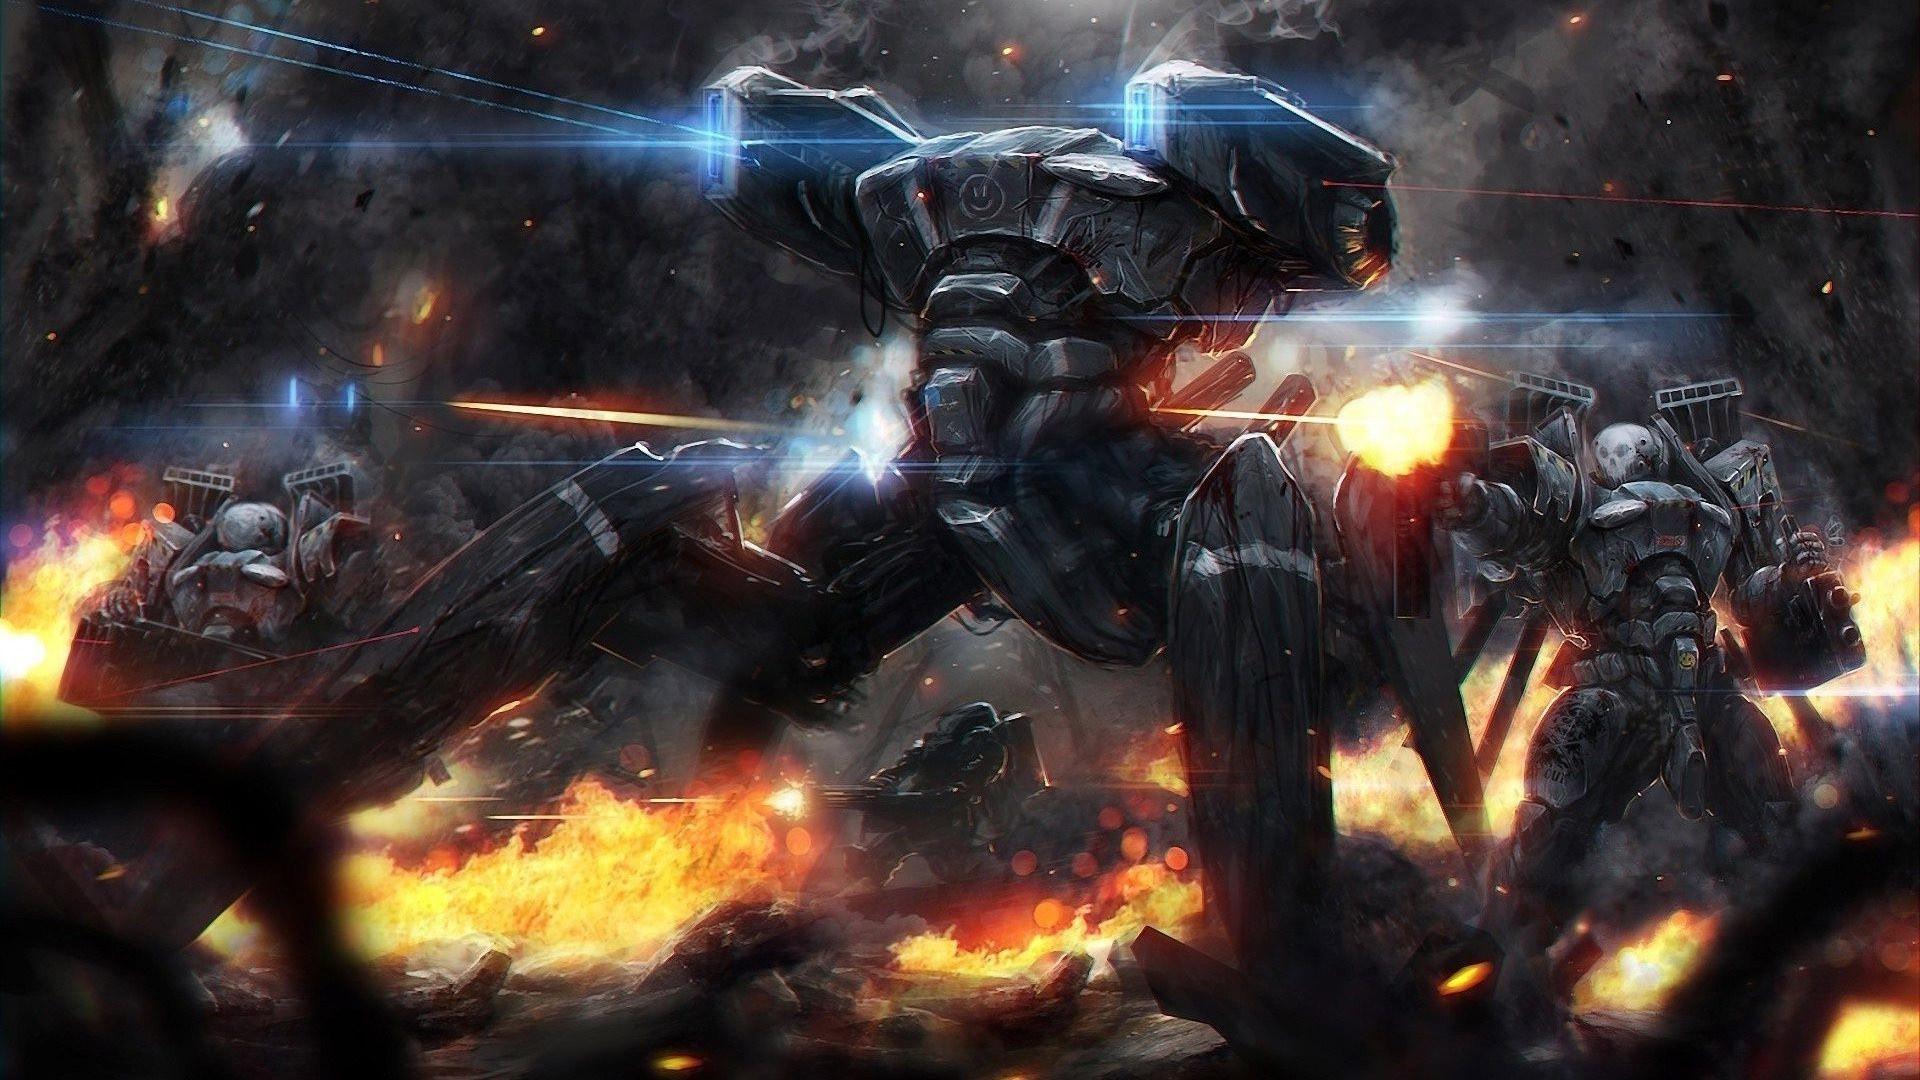 robot, Mech, Artwork, War, Destruction, Fantasy Art, Concept Art, Soldier Wallpapers  HD / Desktop and Mobile Backgrounds